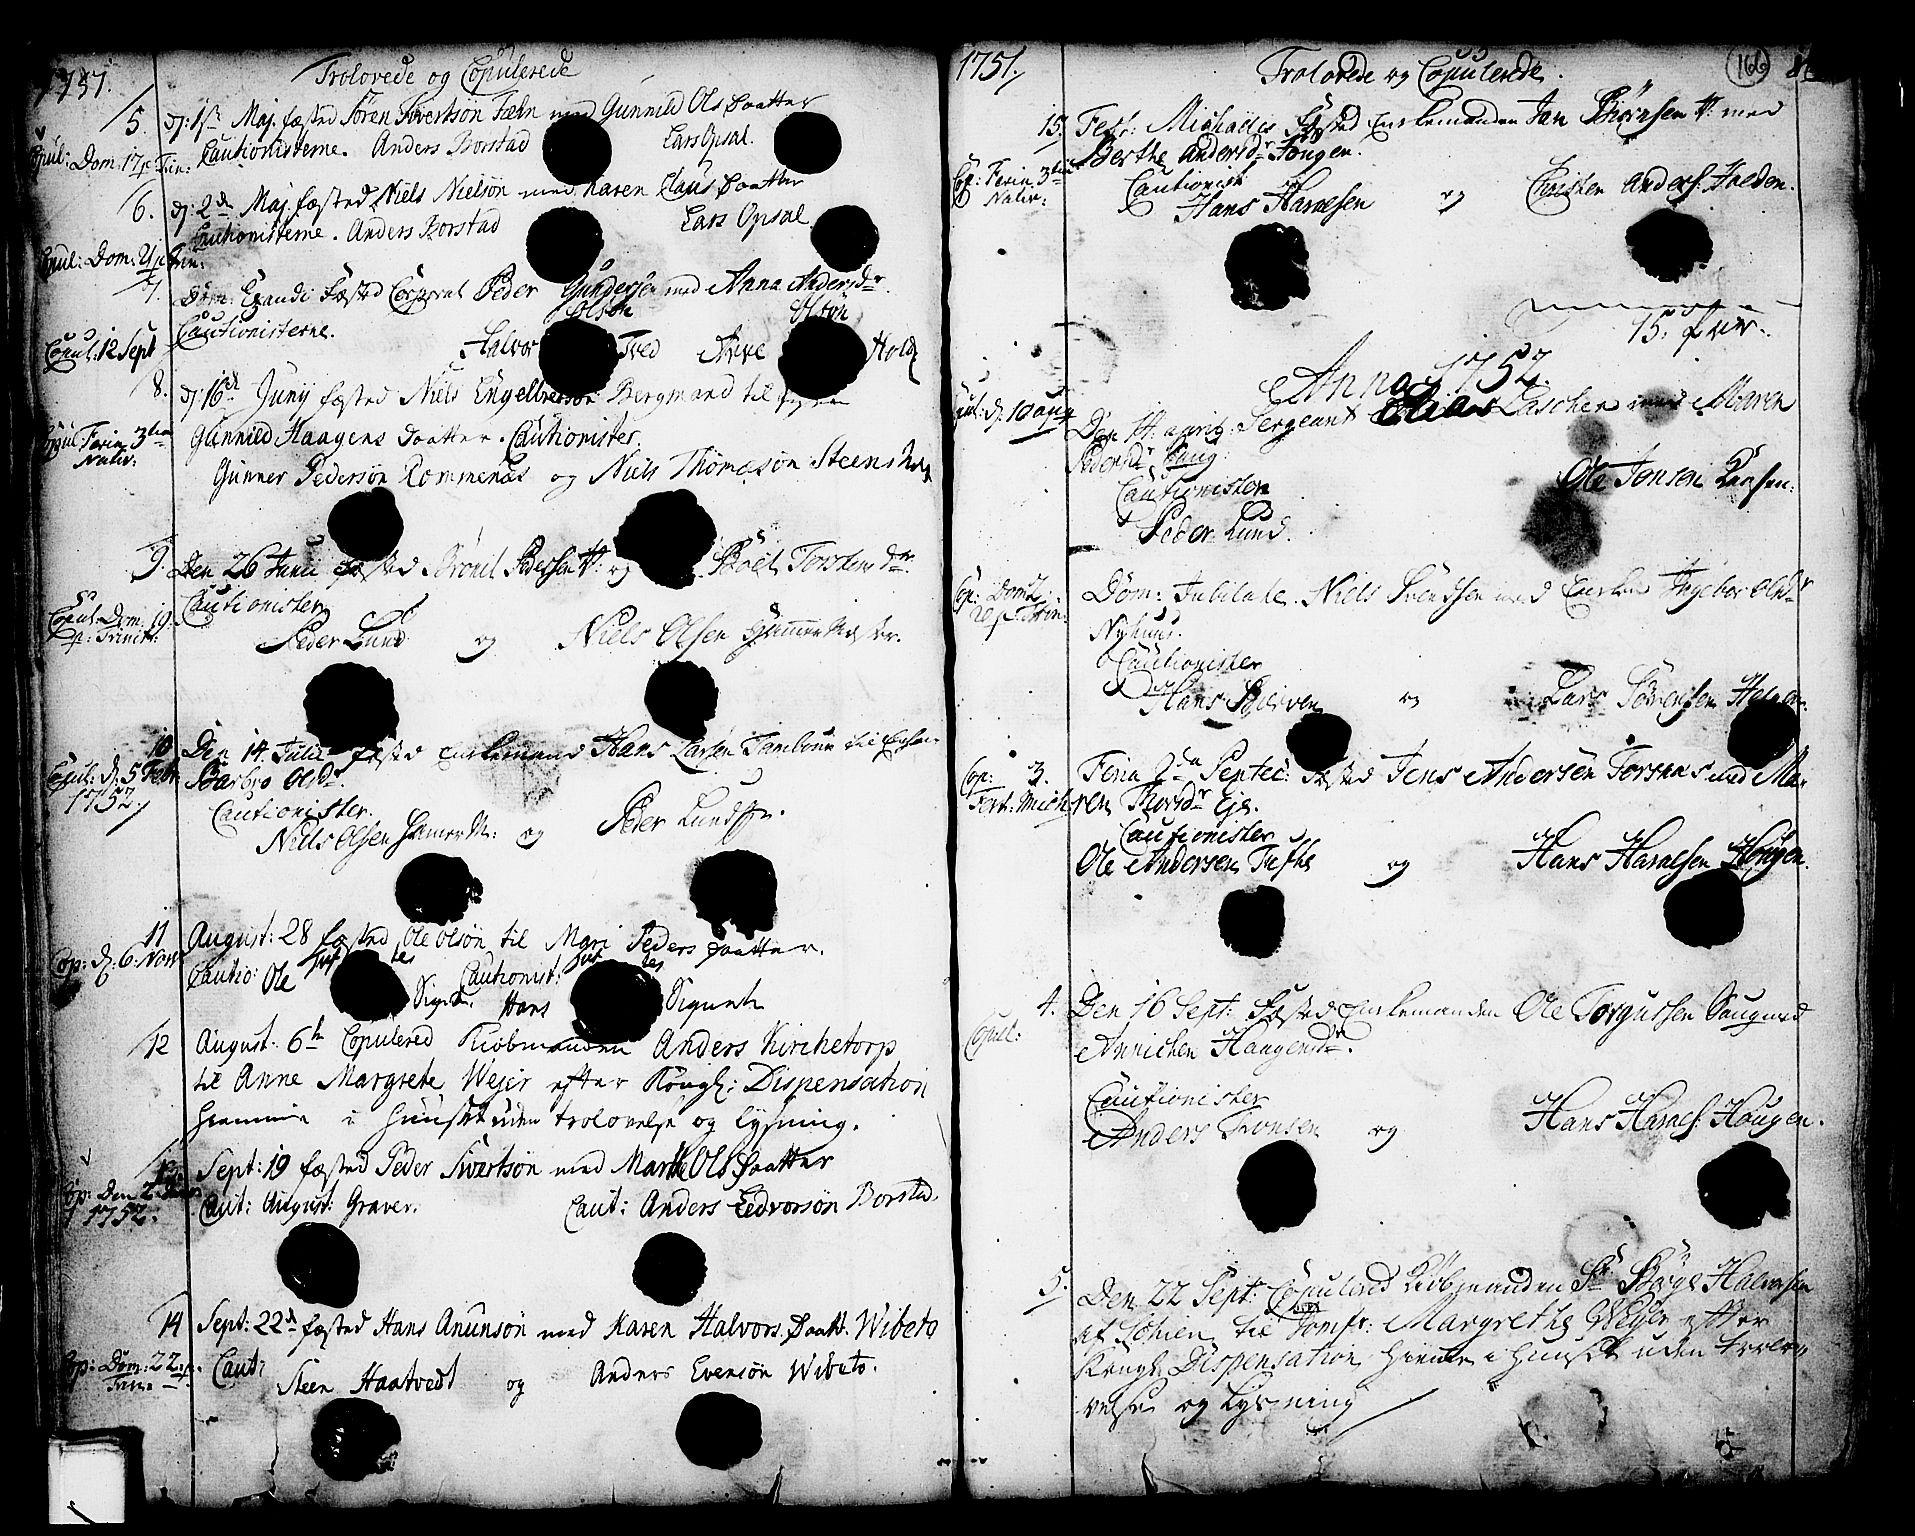 SAKO, Holla kirkebøker, F/Fa/L0001: Ministerialbok nr. 1, 1717-1779, s. 166